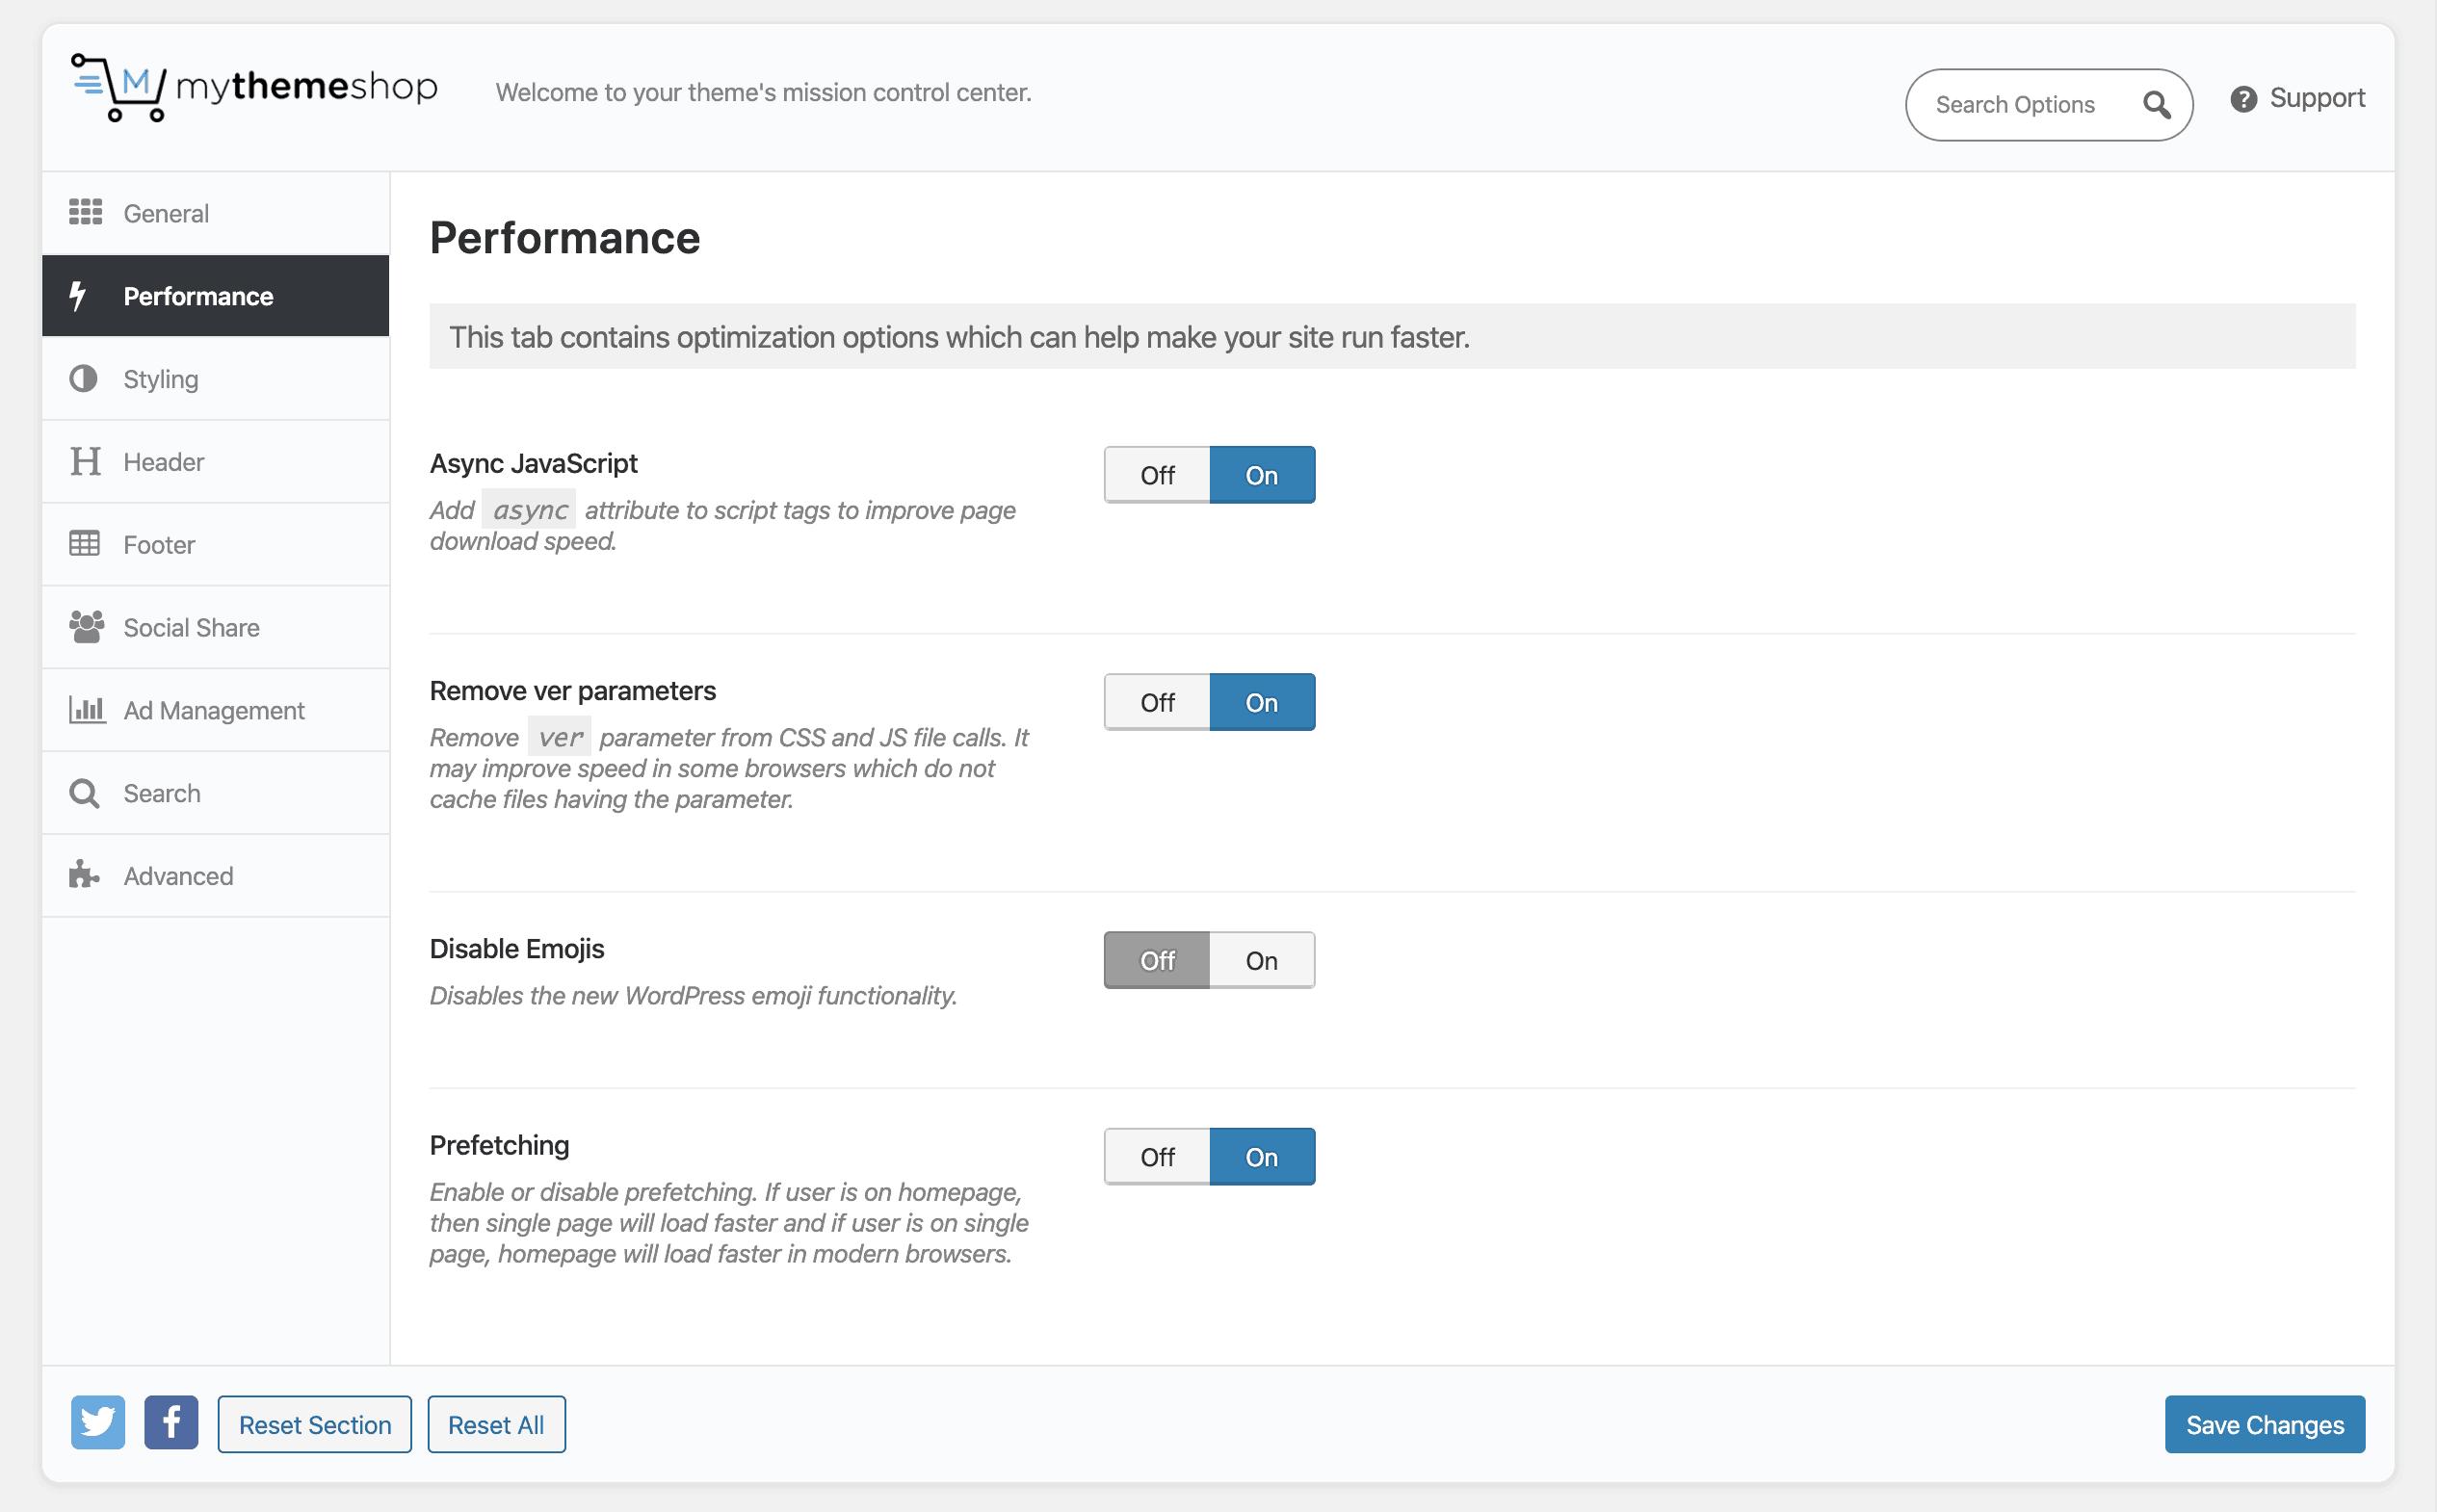 MyThemeShop Options Panel